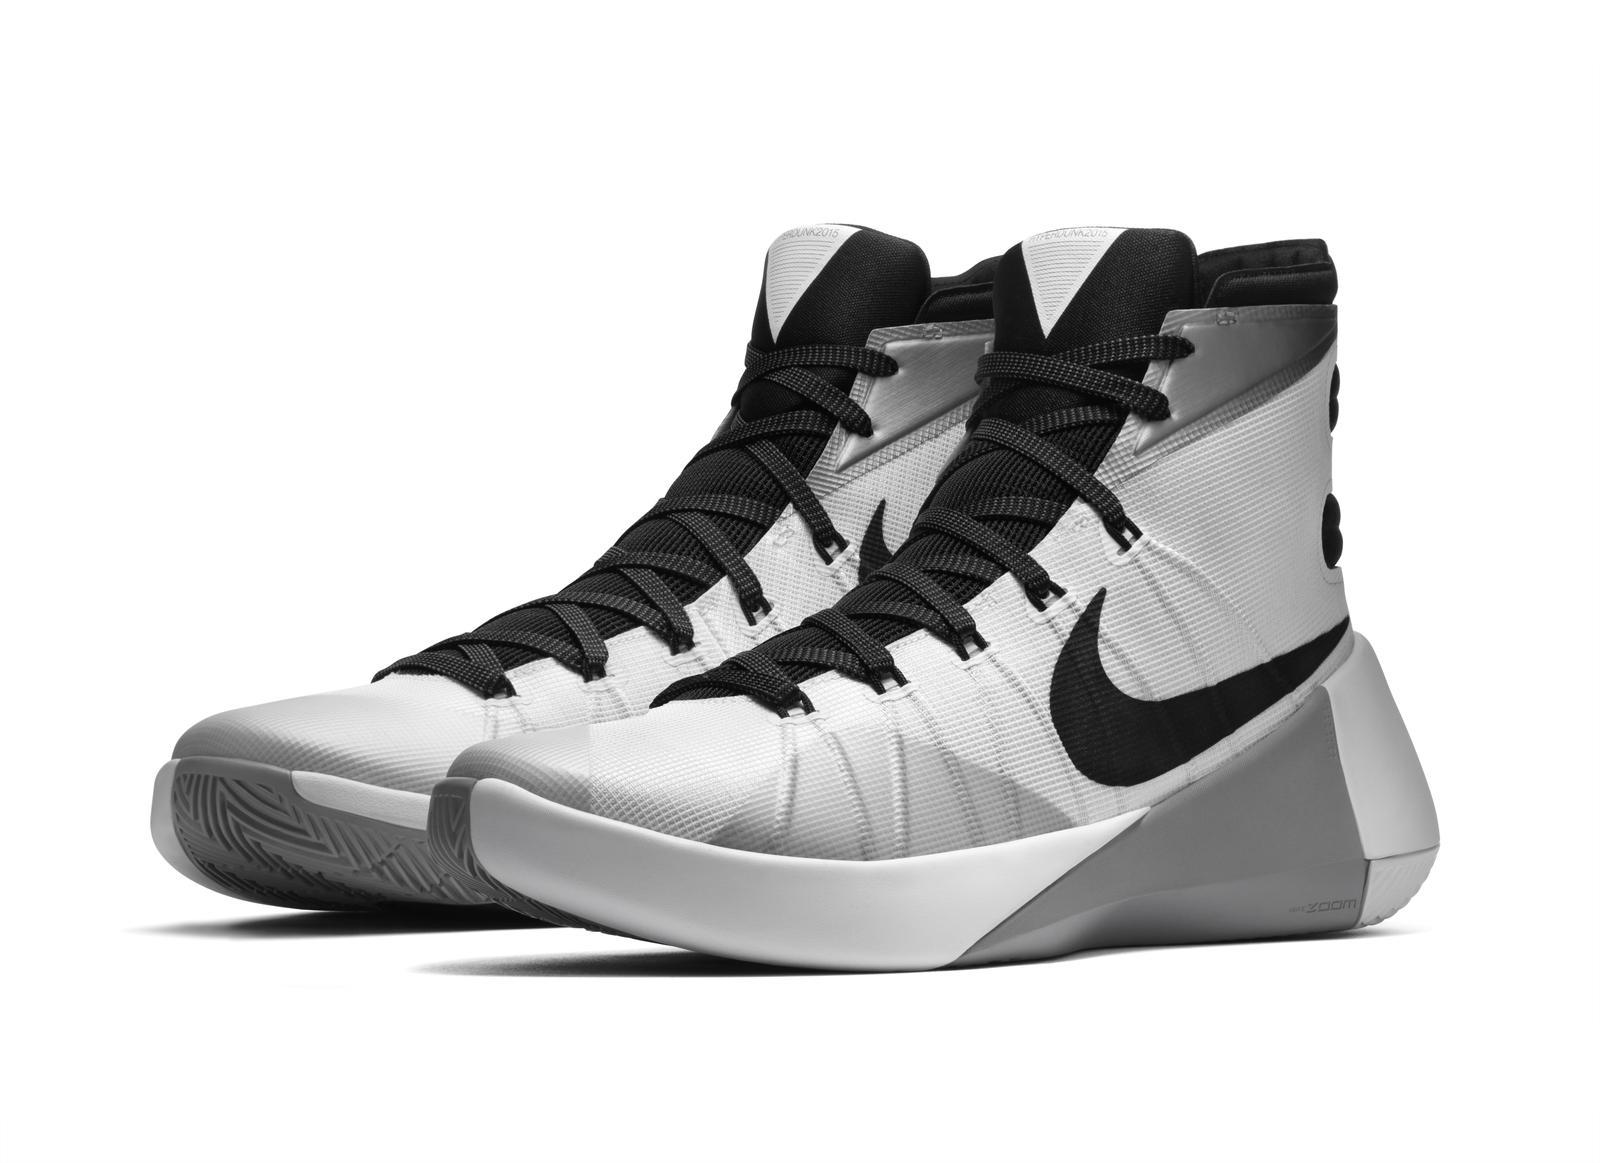 new concept c48fe 1fef0 Nike Unveils the Hyperdunk 2015